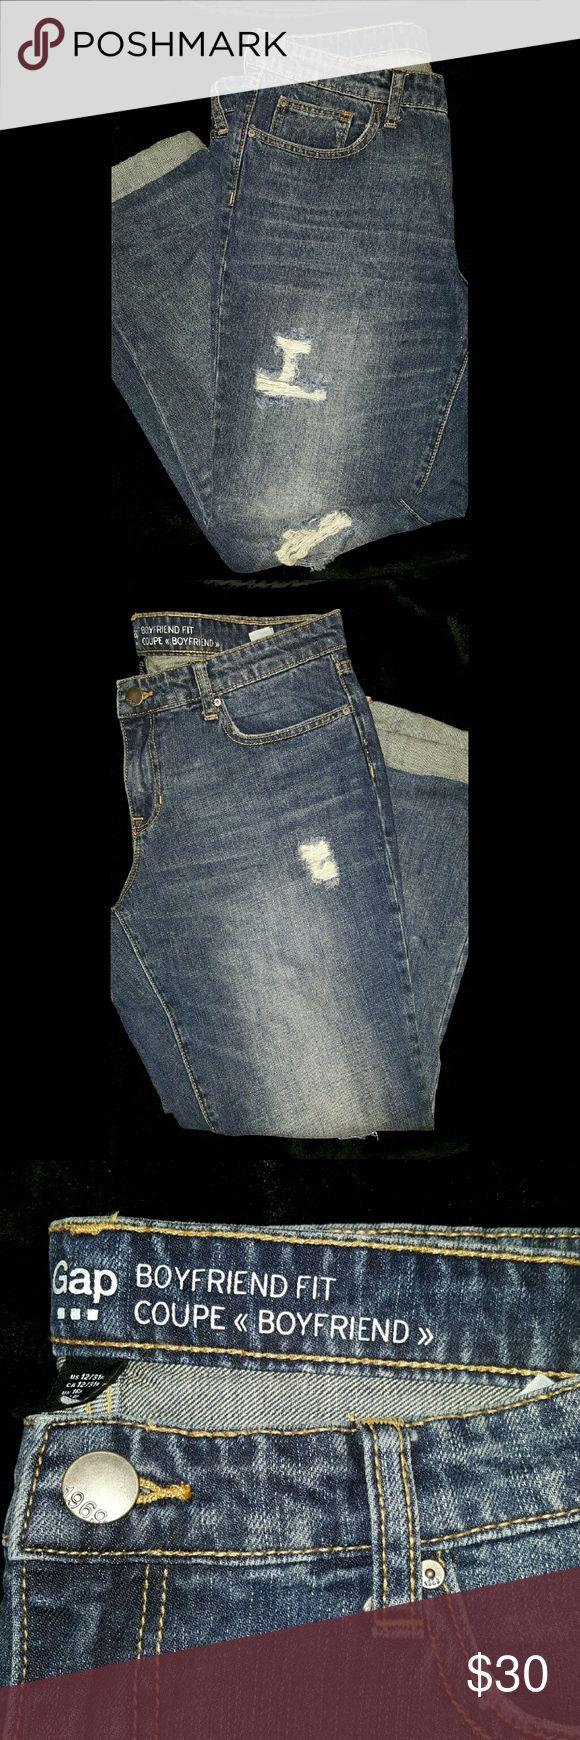 Gap Boyfriend Fit Jeans 100% Cotton Trendy Distressed Dark Denim Boyfriend Jeans. Size 12/31r GAP Jeans Ankle & Cropped